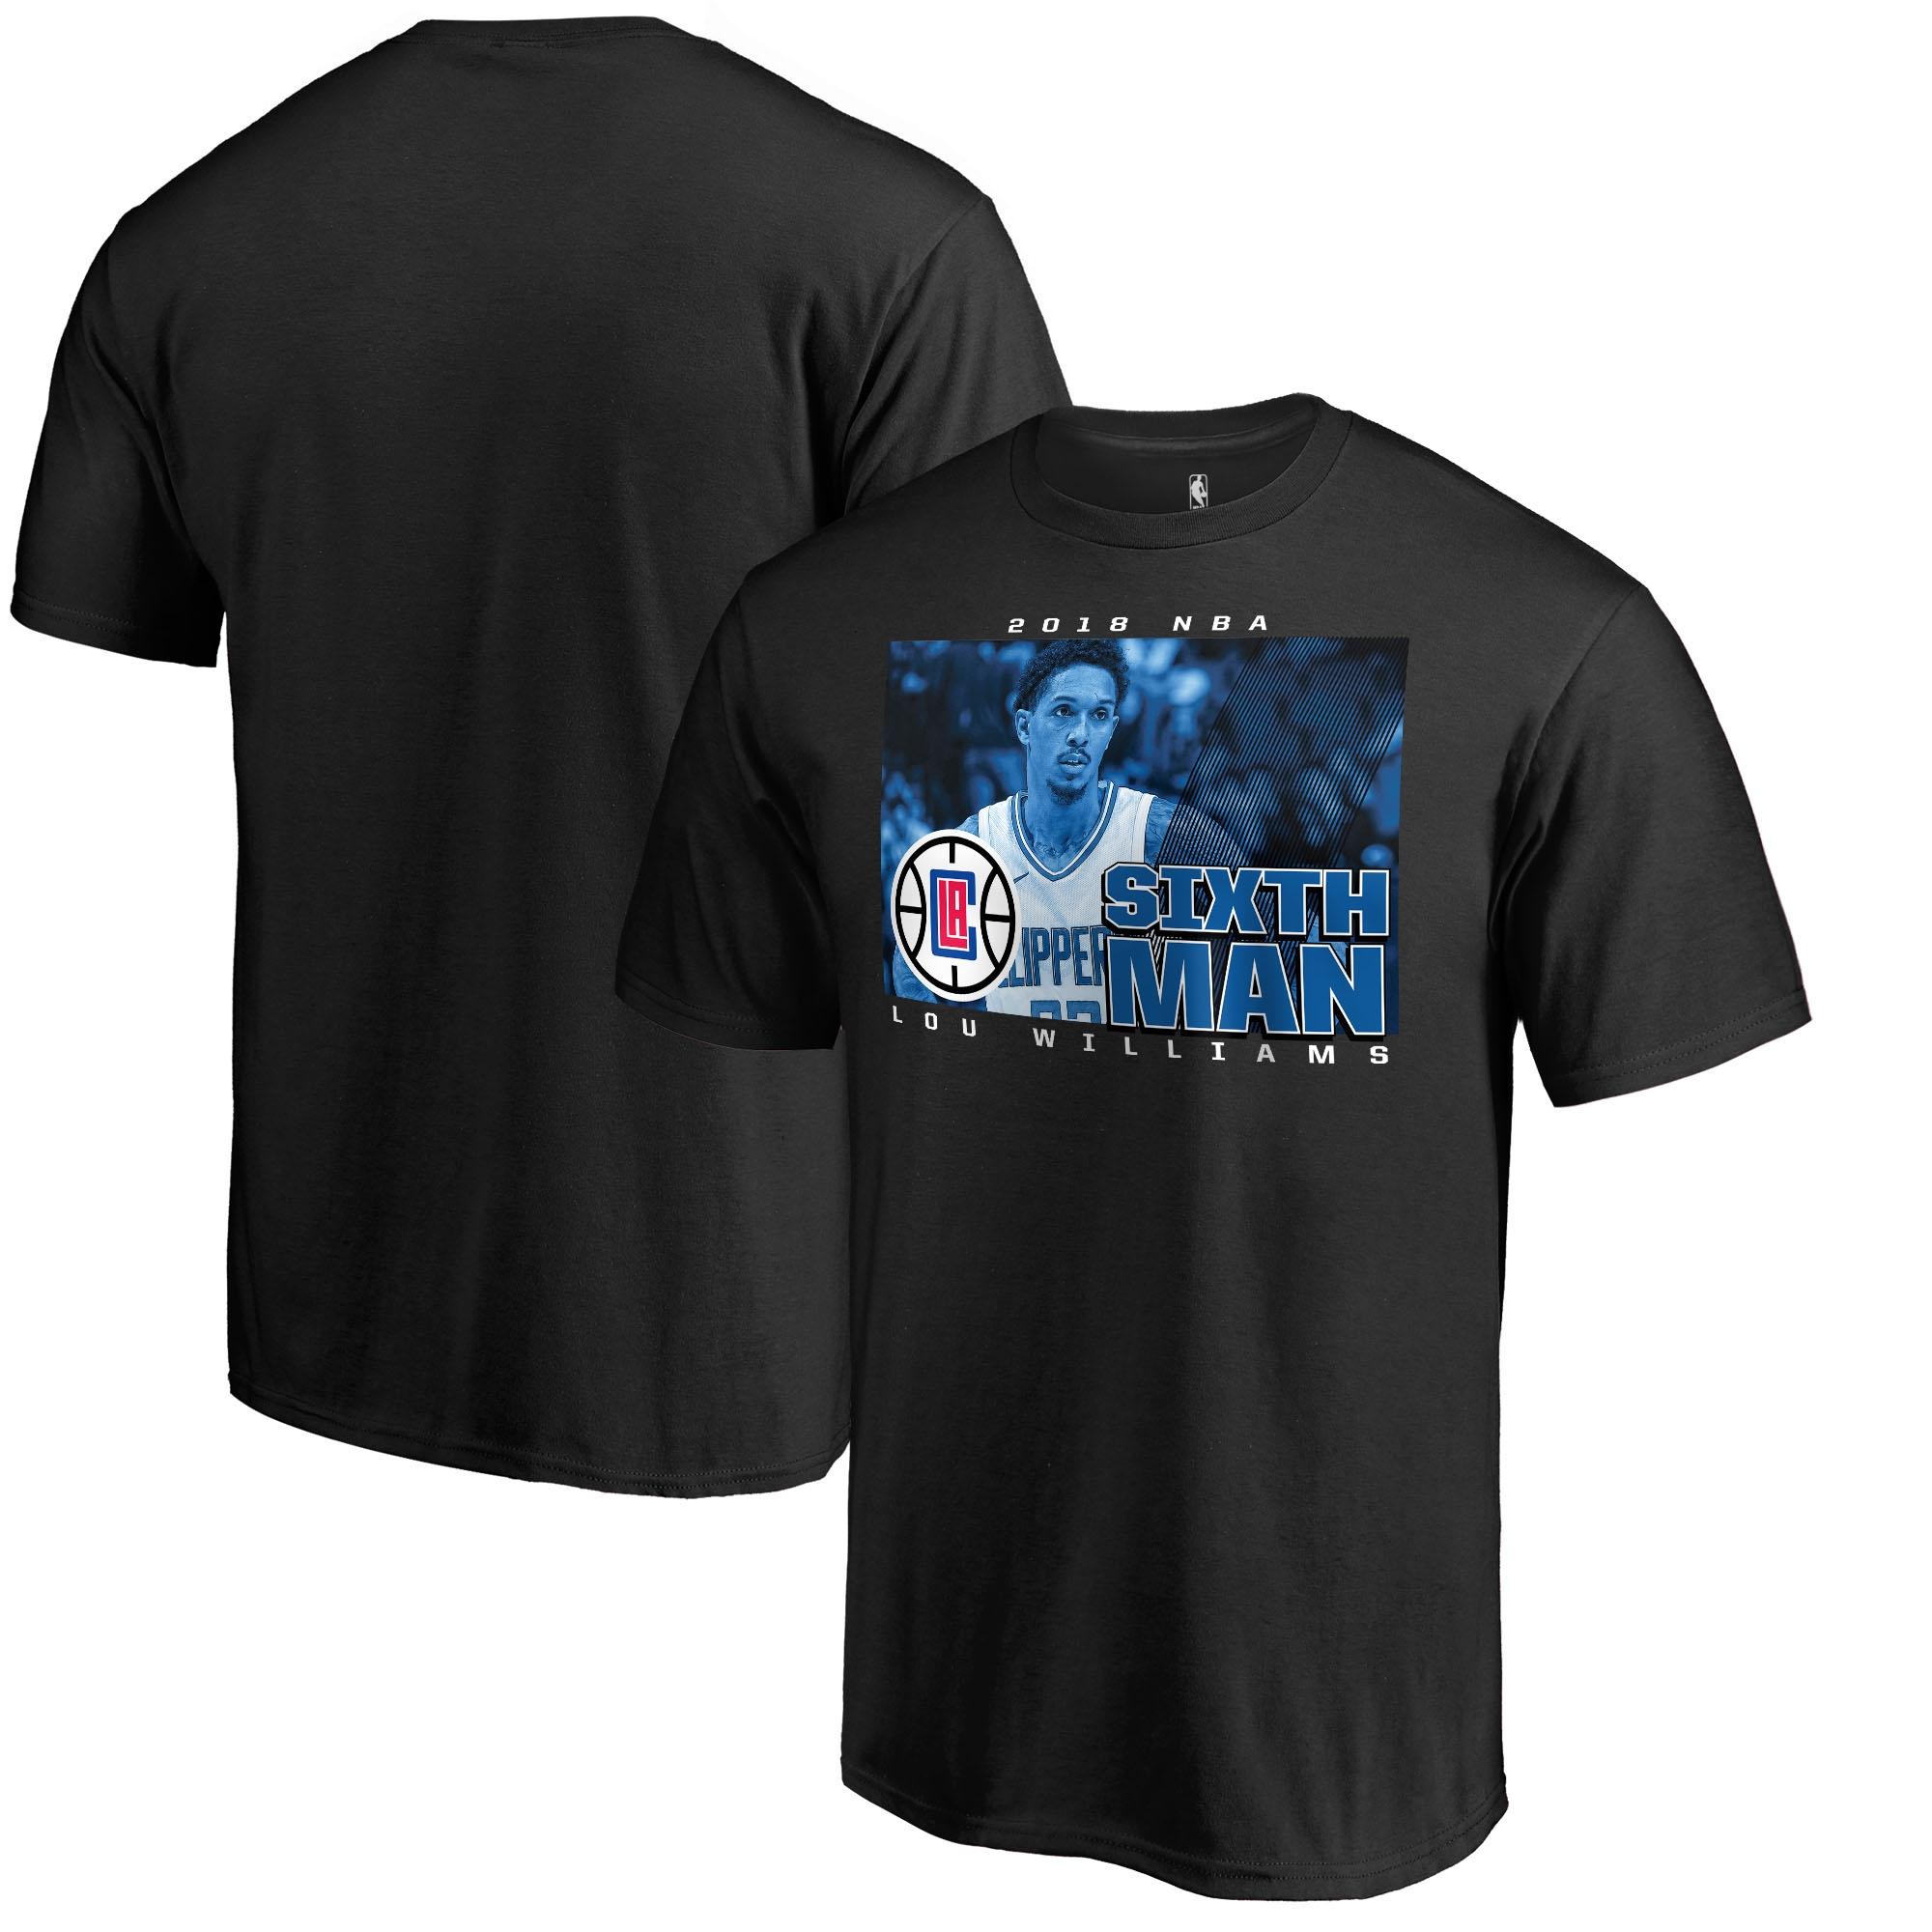 Lou Williams LA Clippers Fanatics Branded 2018 NBA 6th Man of the Year T-Shirt - Black